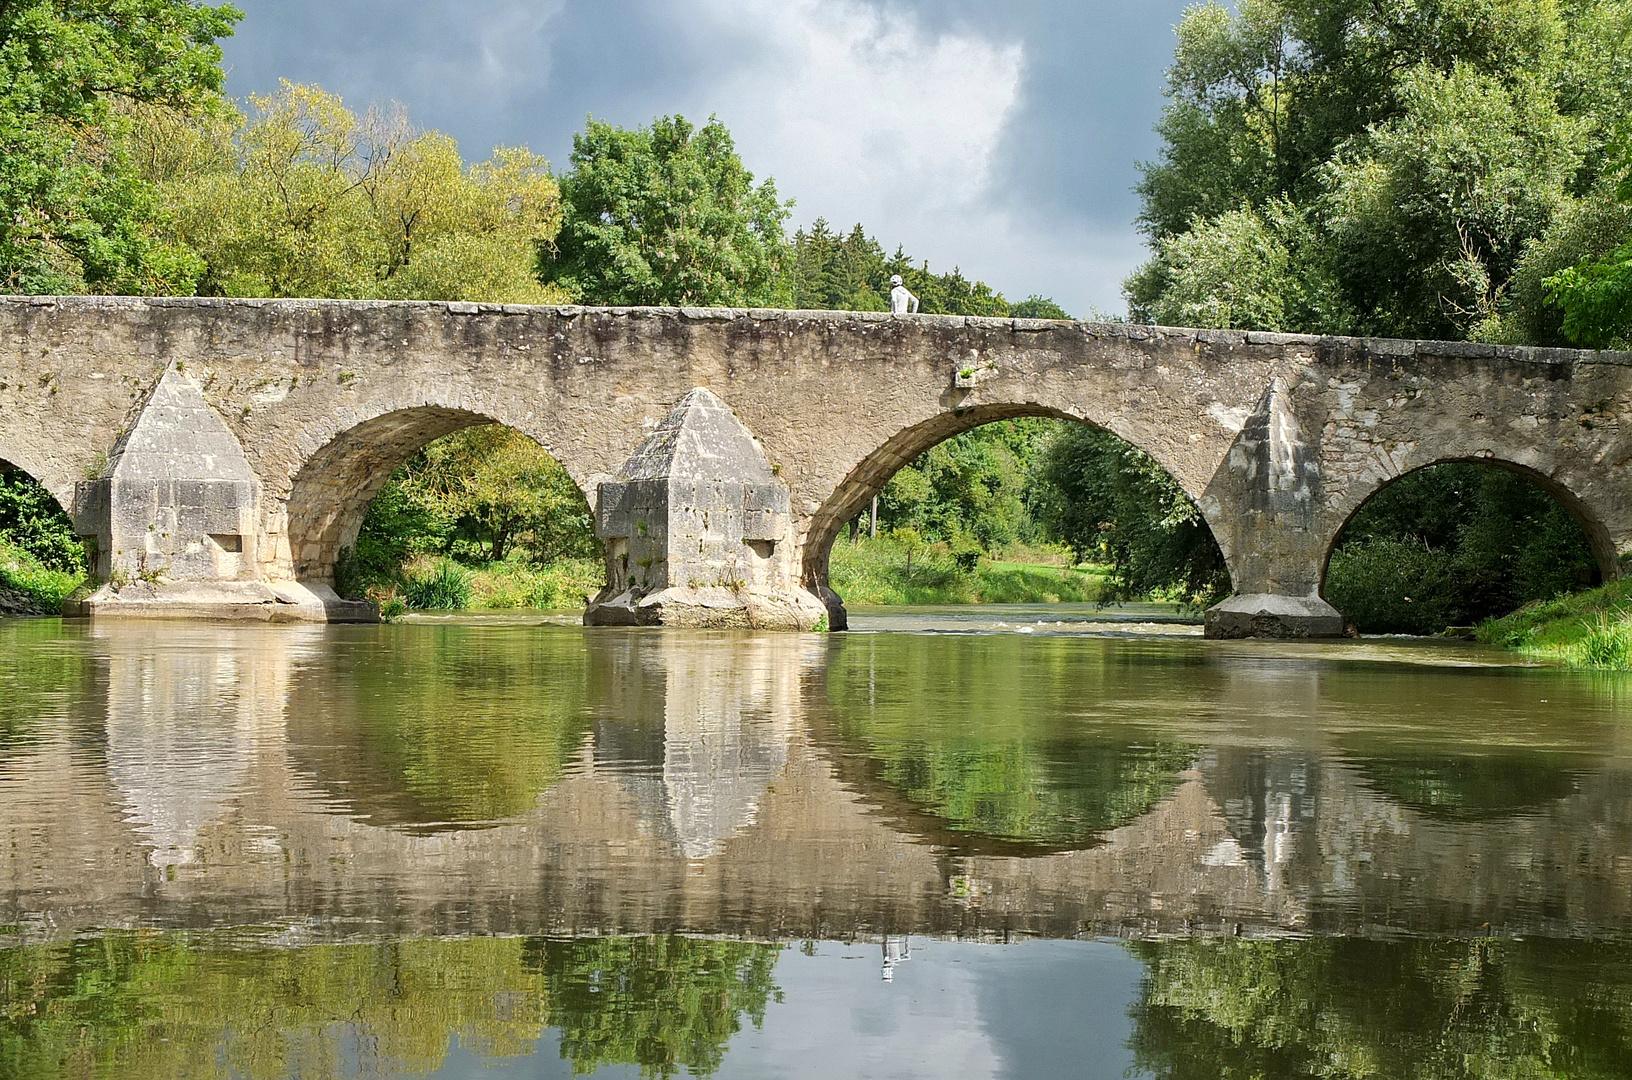 Brücke über die Altmühl